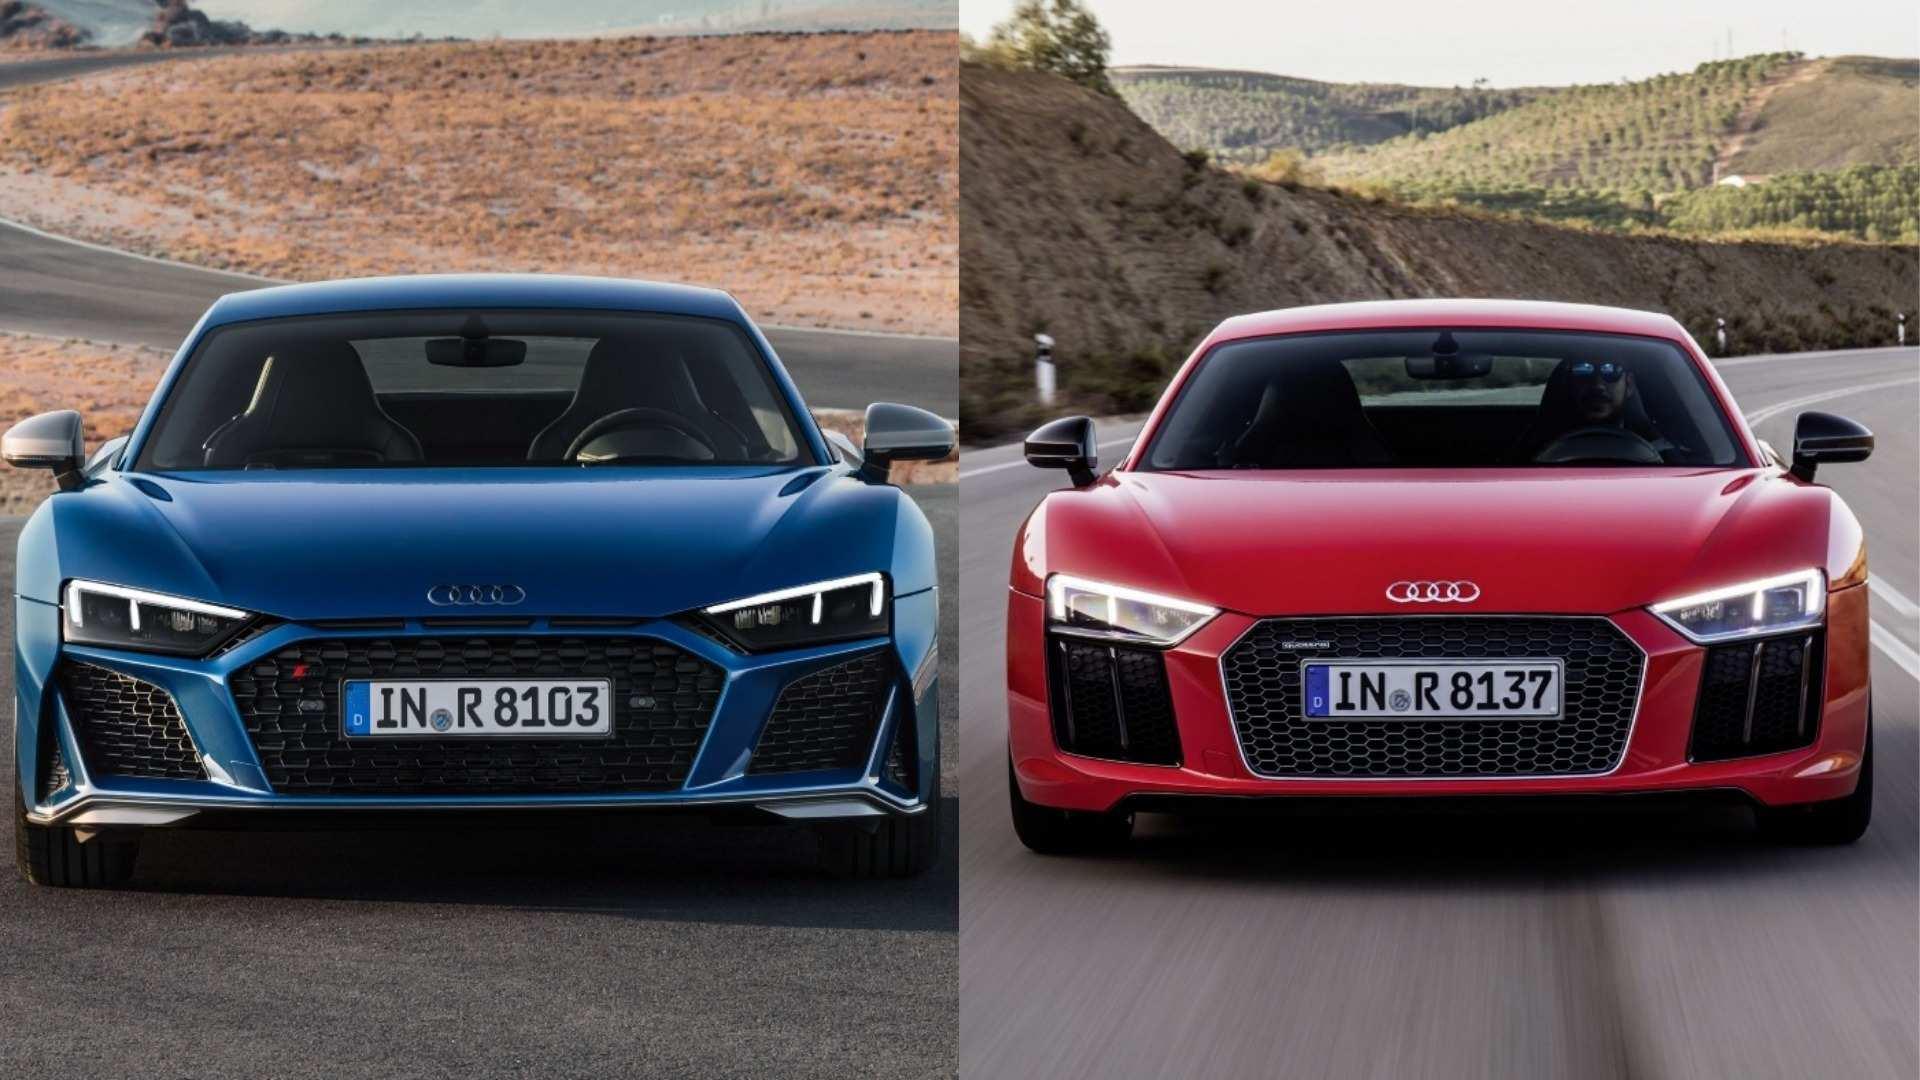 22 All New Audi Supercar 2020 Concept for Audi Supercar 2020